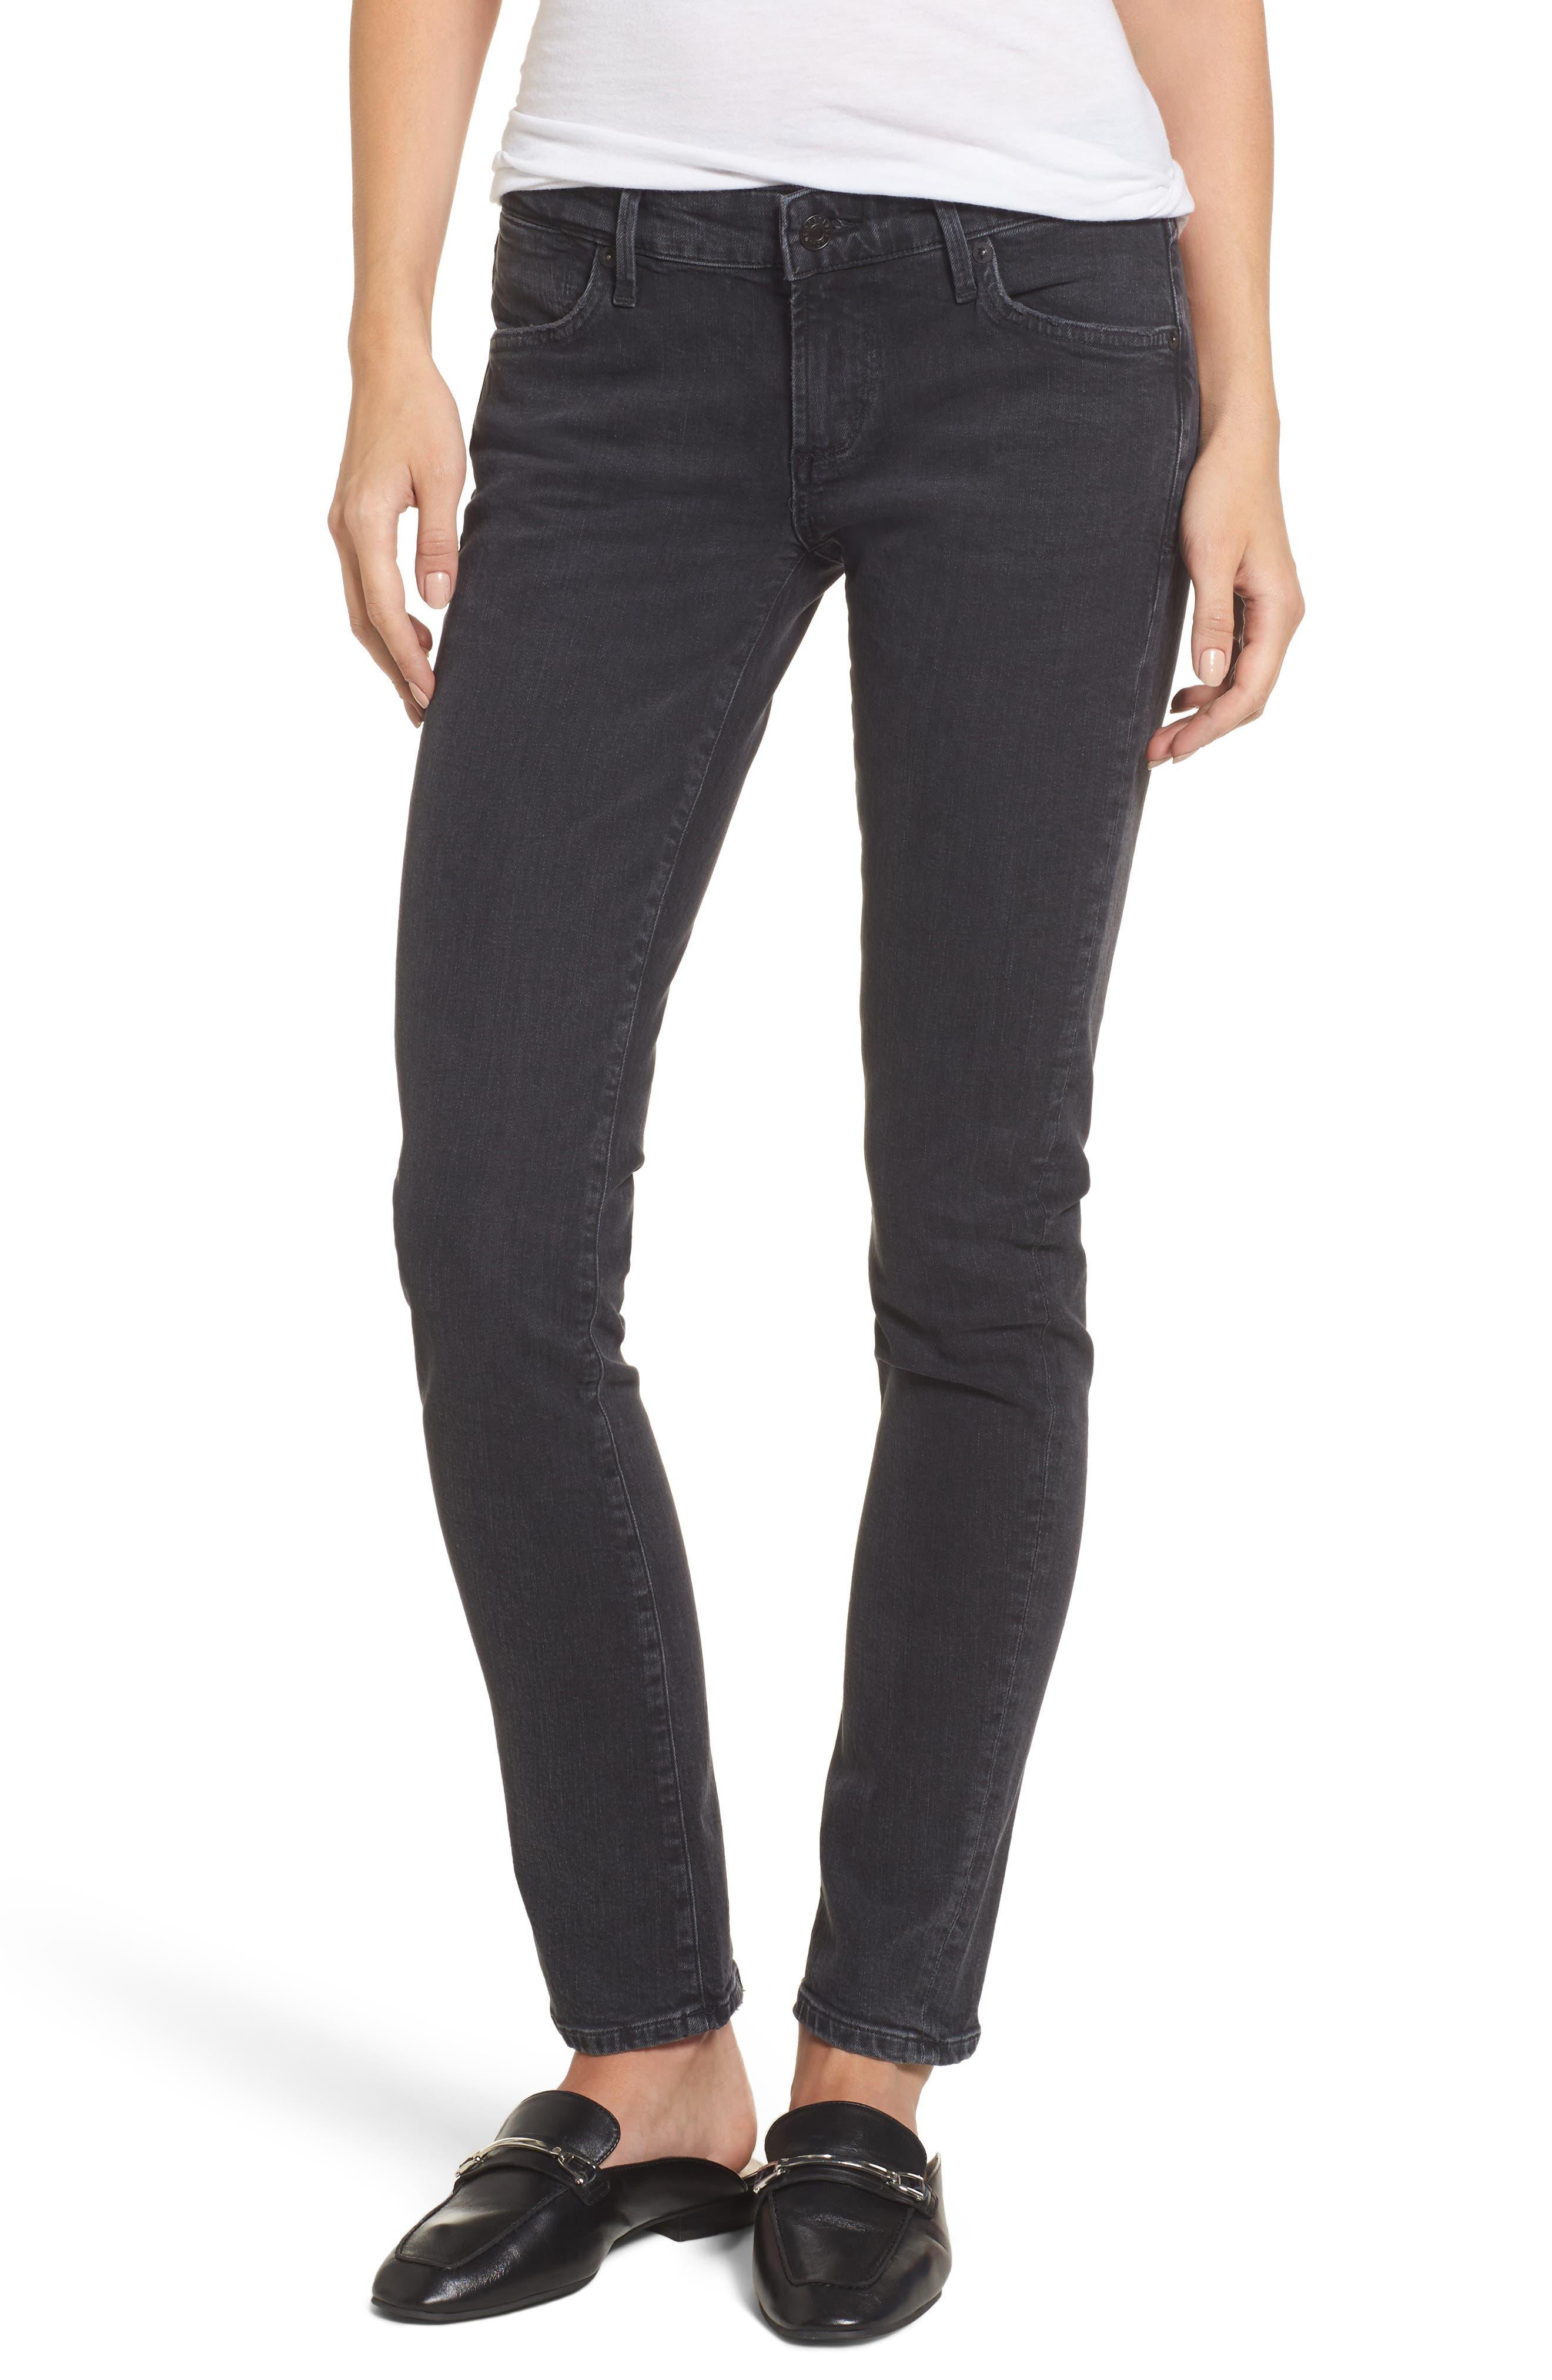 Chloe Low Rise Slim Jeans,                         Main,                         color, Chelsea